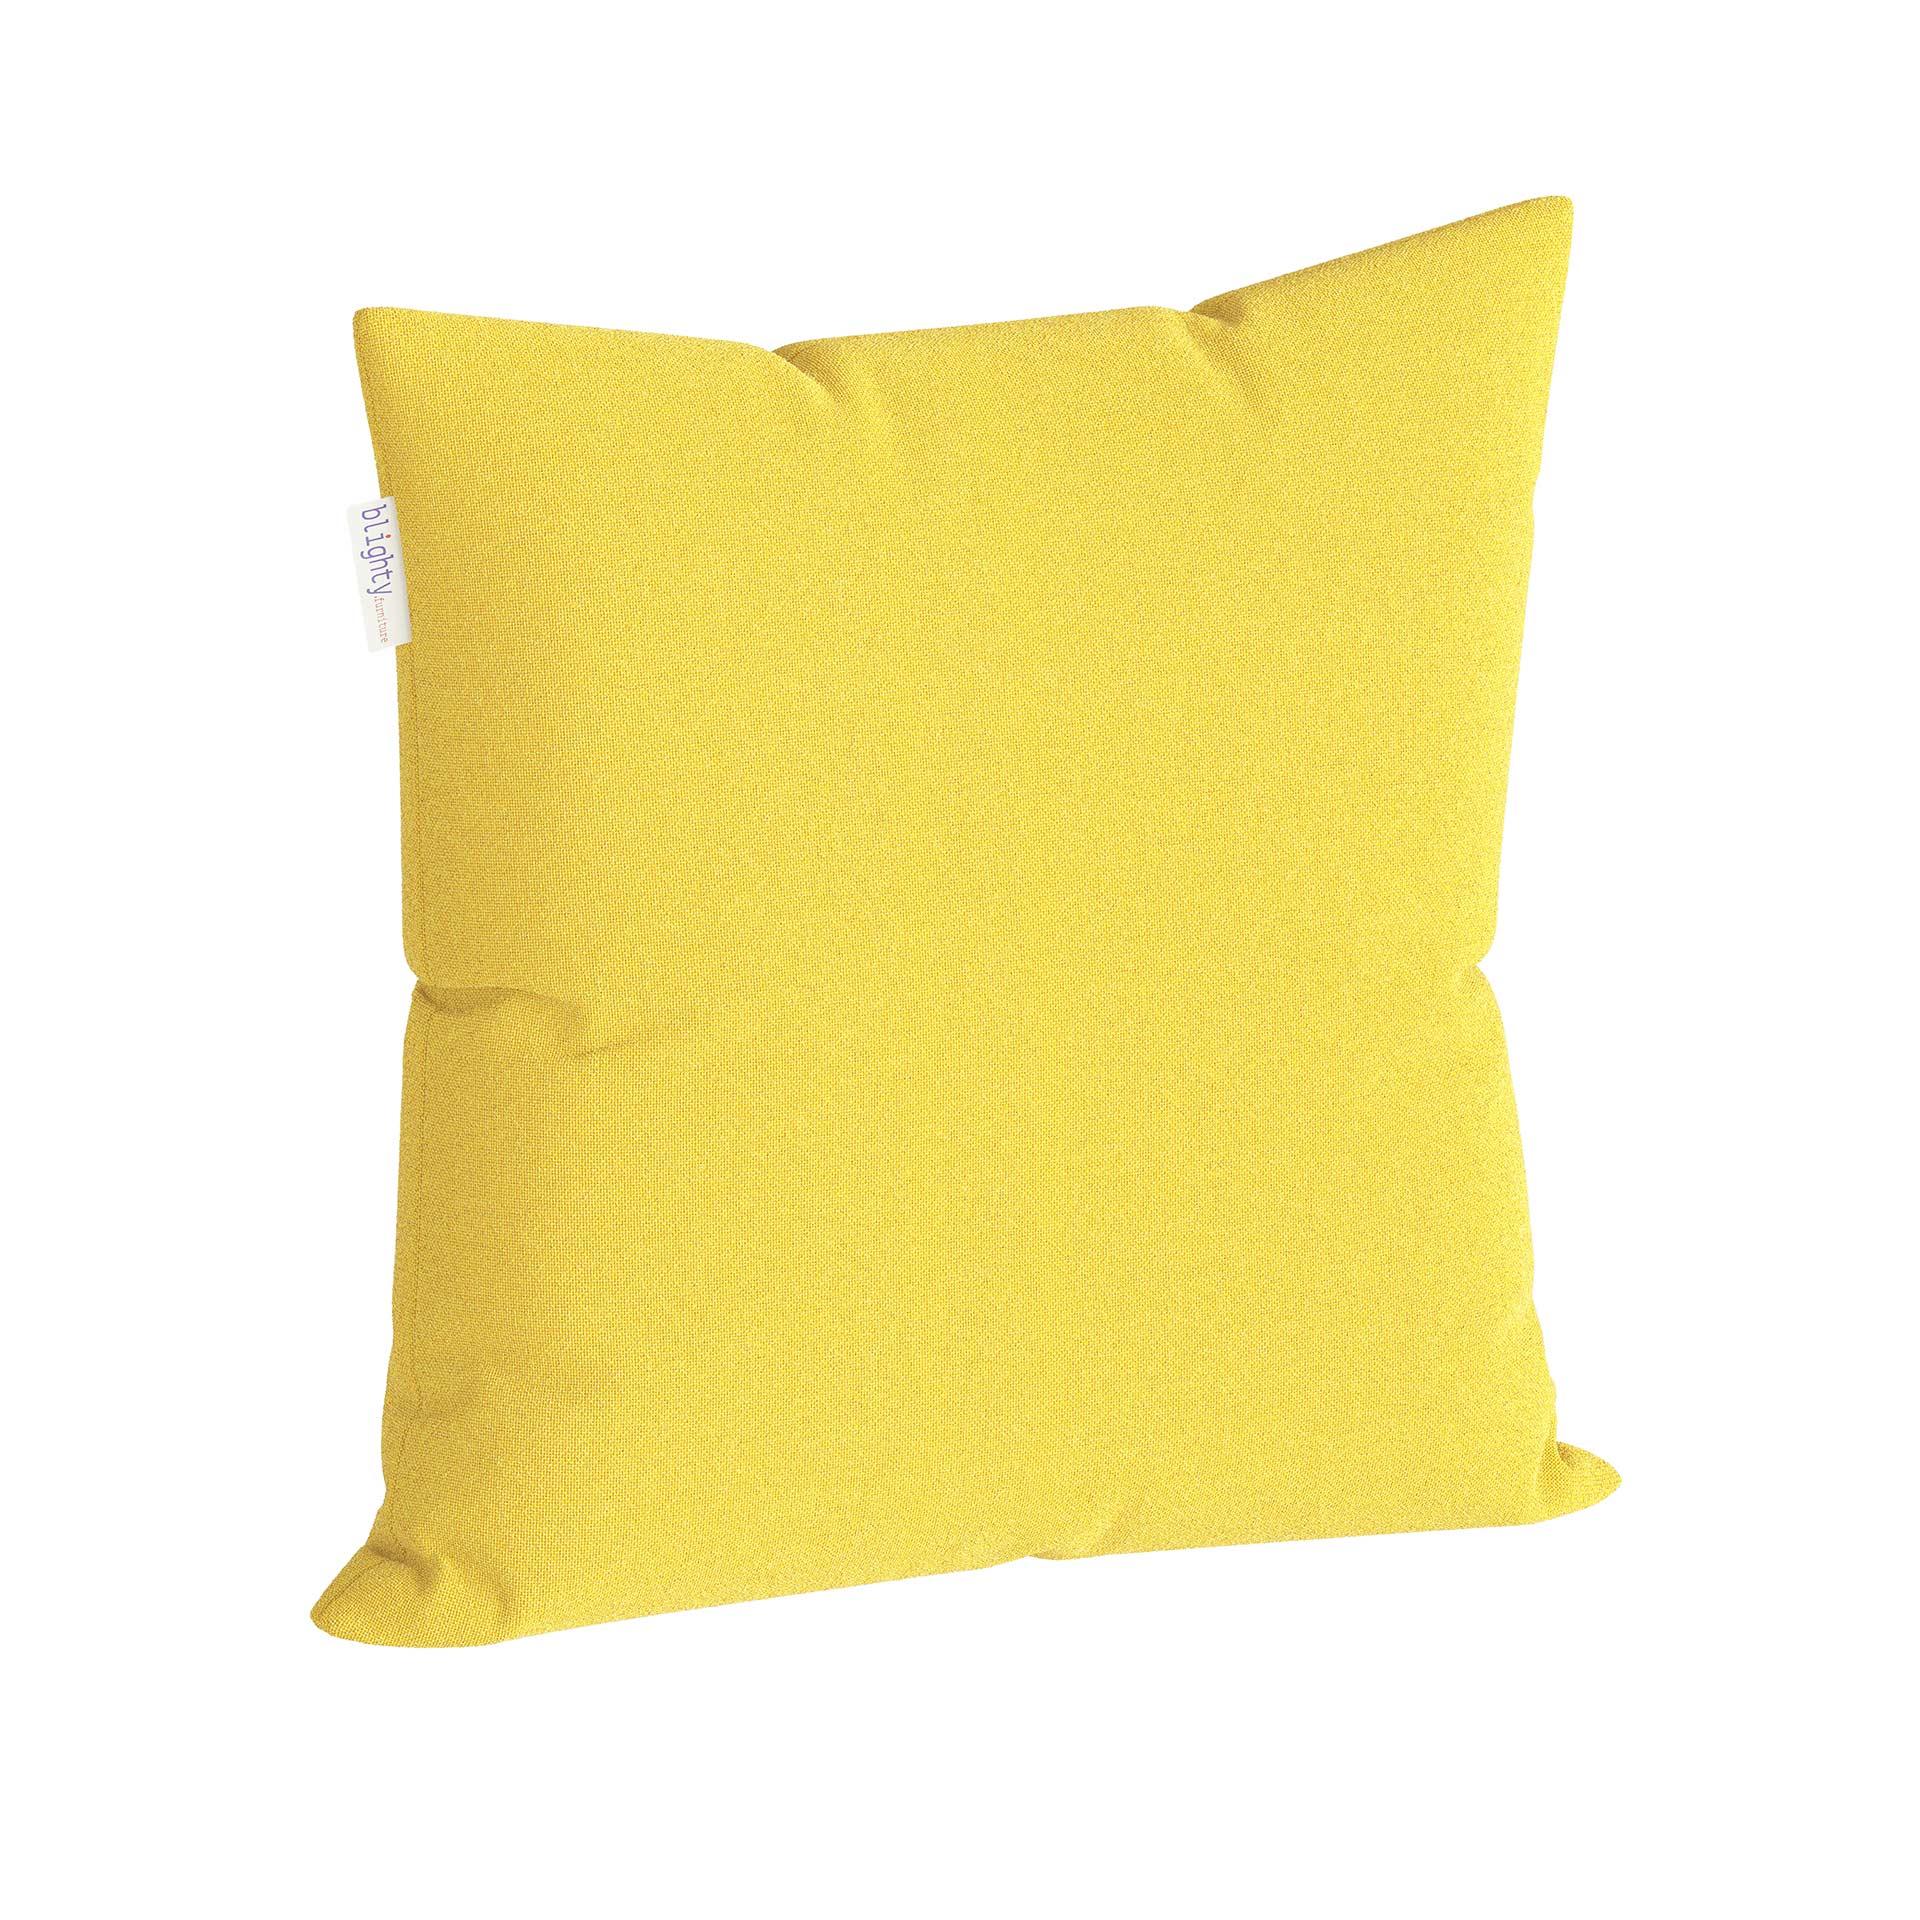 Amazon Image Yellow Pillow (1)